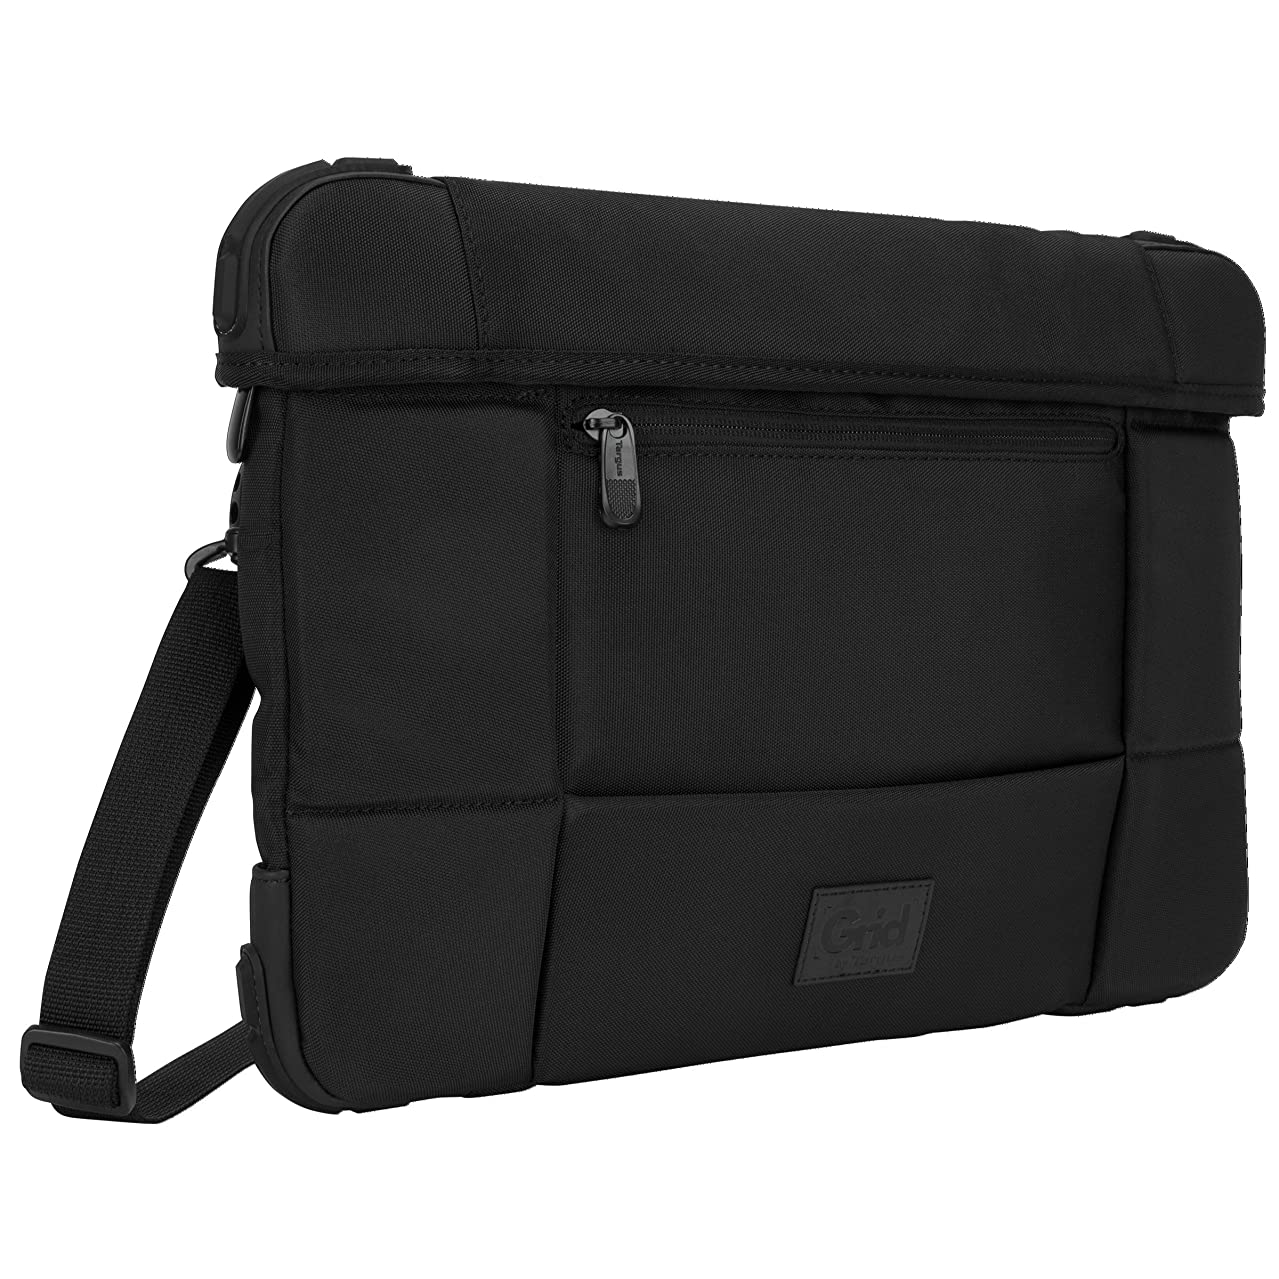 Targus Grid Mil Spec Rugged Slipcase for Laptops Up To 14.1 Inches, Black (TSS846)